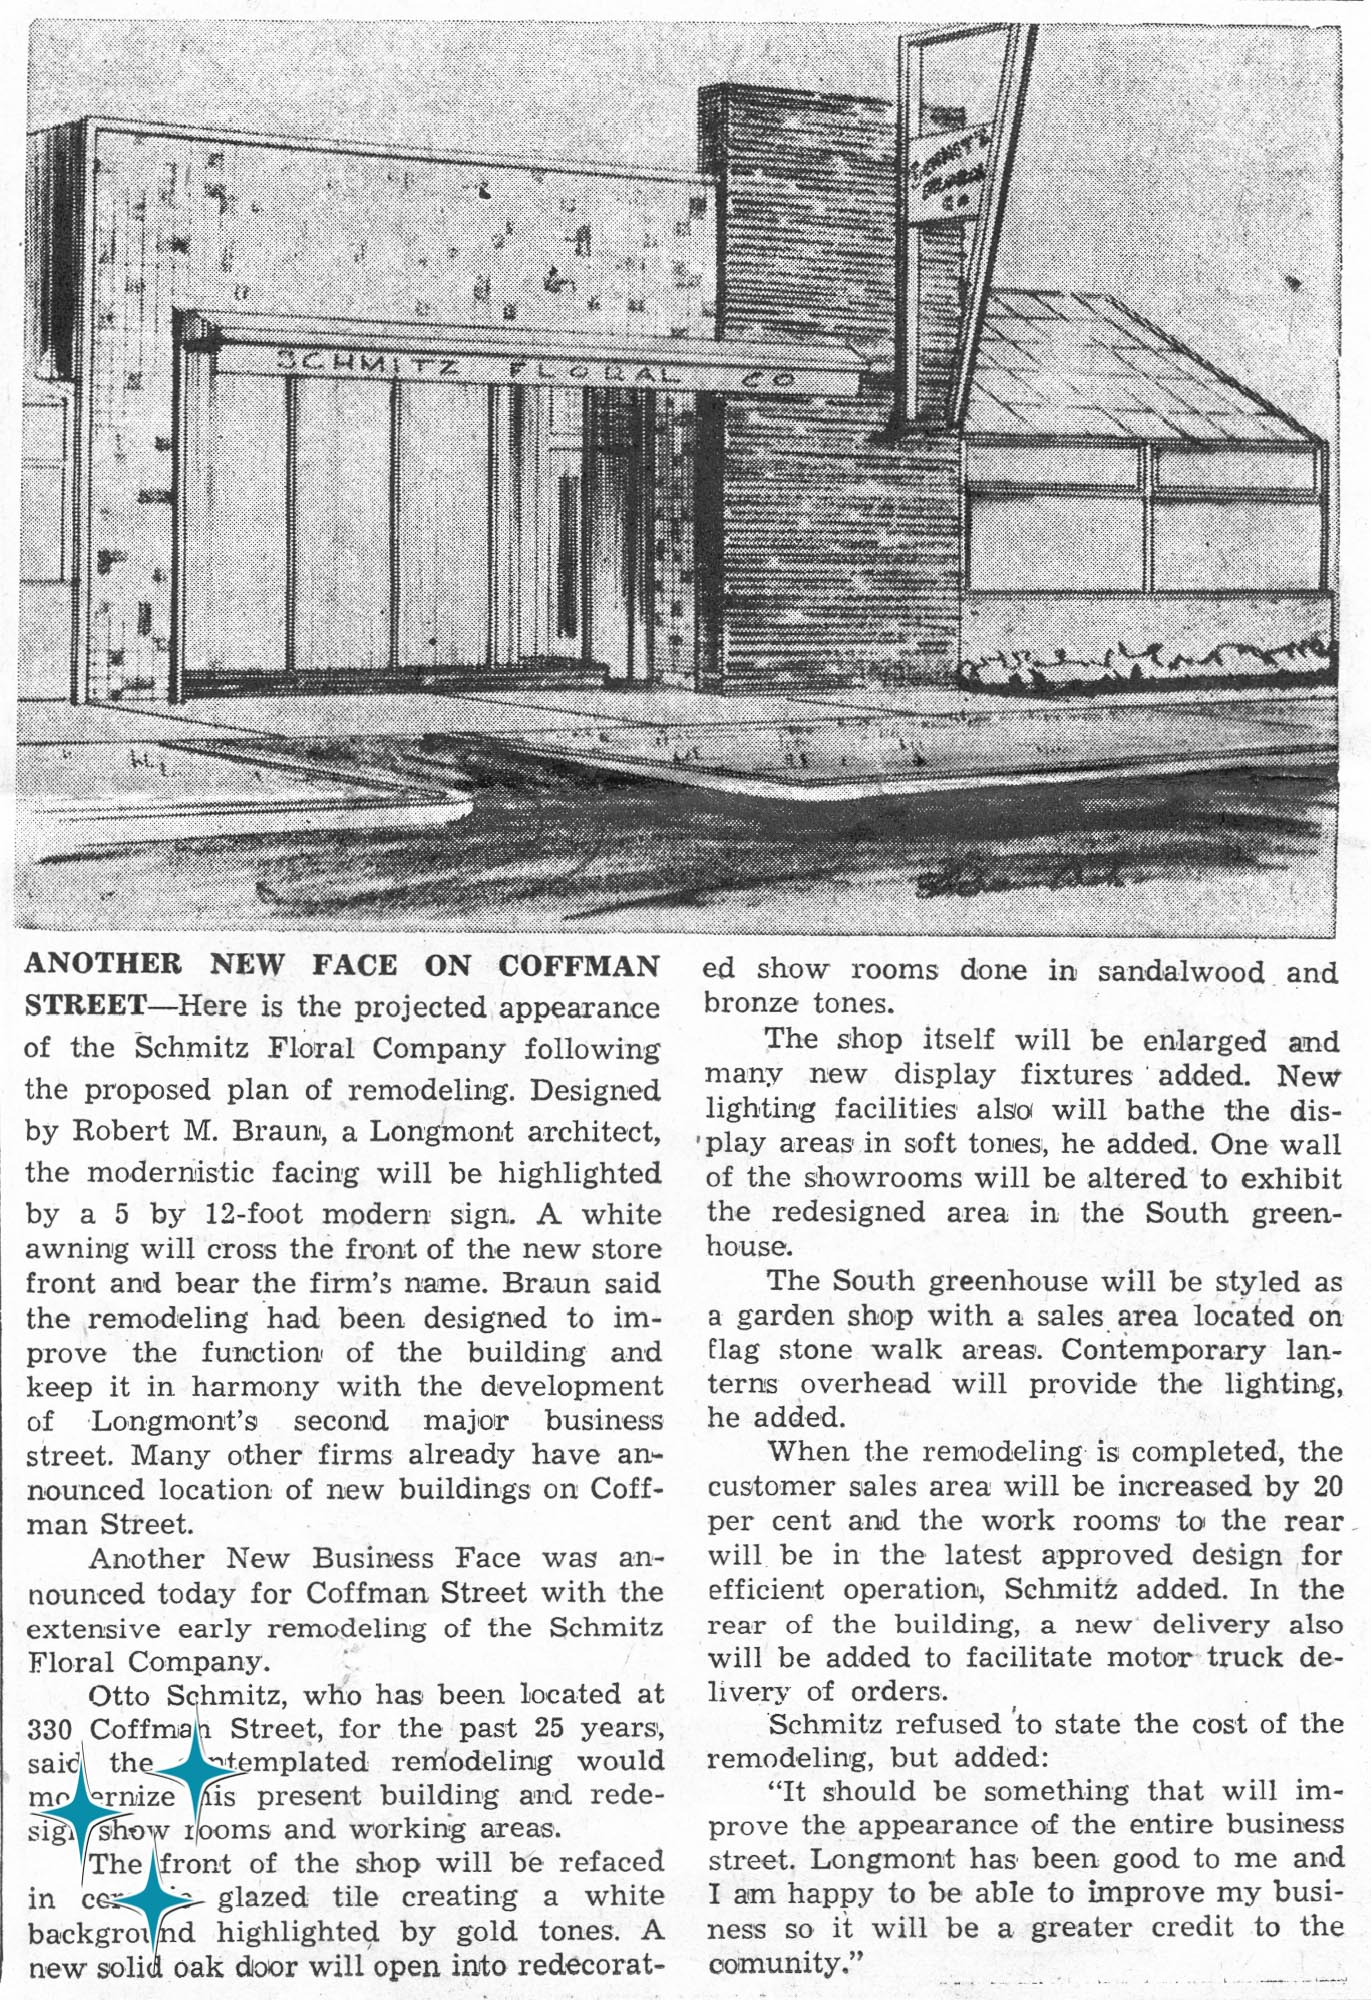 Adrian-Kinney-Carr-St-Lakewood-Temporary-Photo-Robert-M-Braun-3.jpg